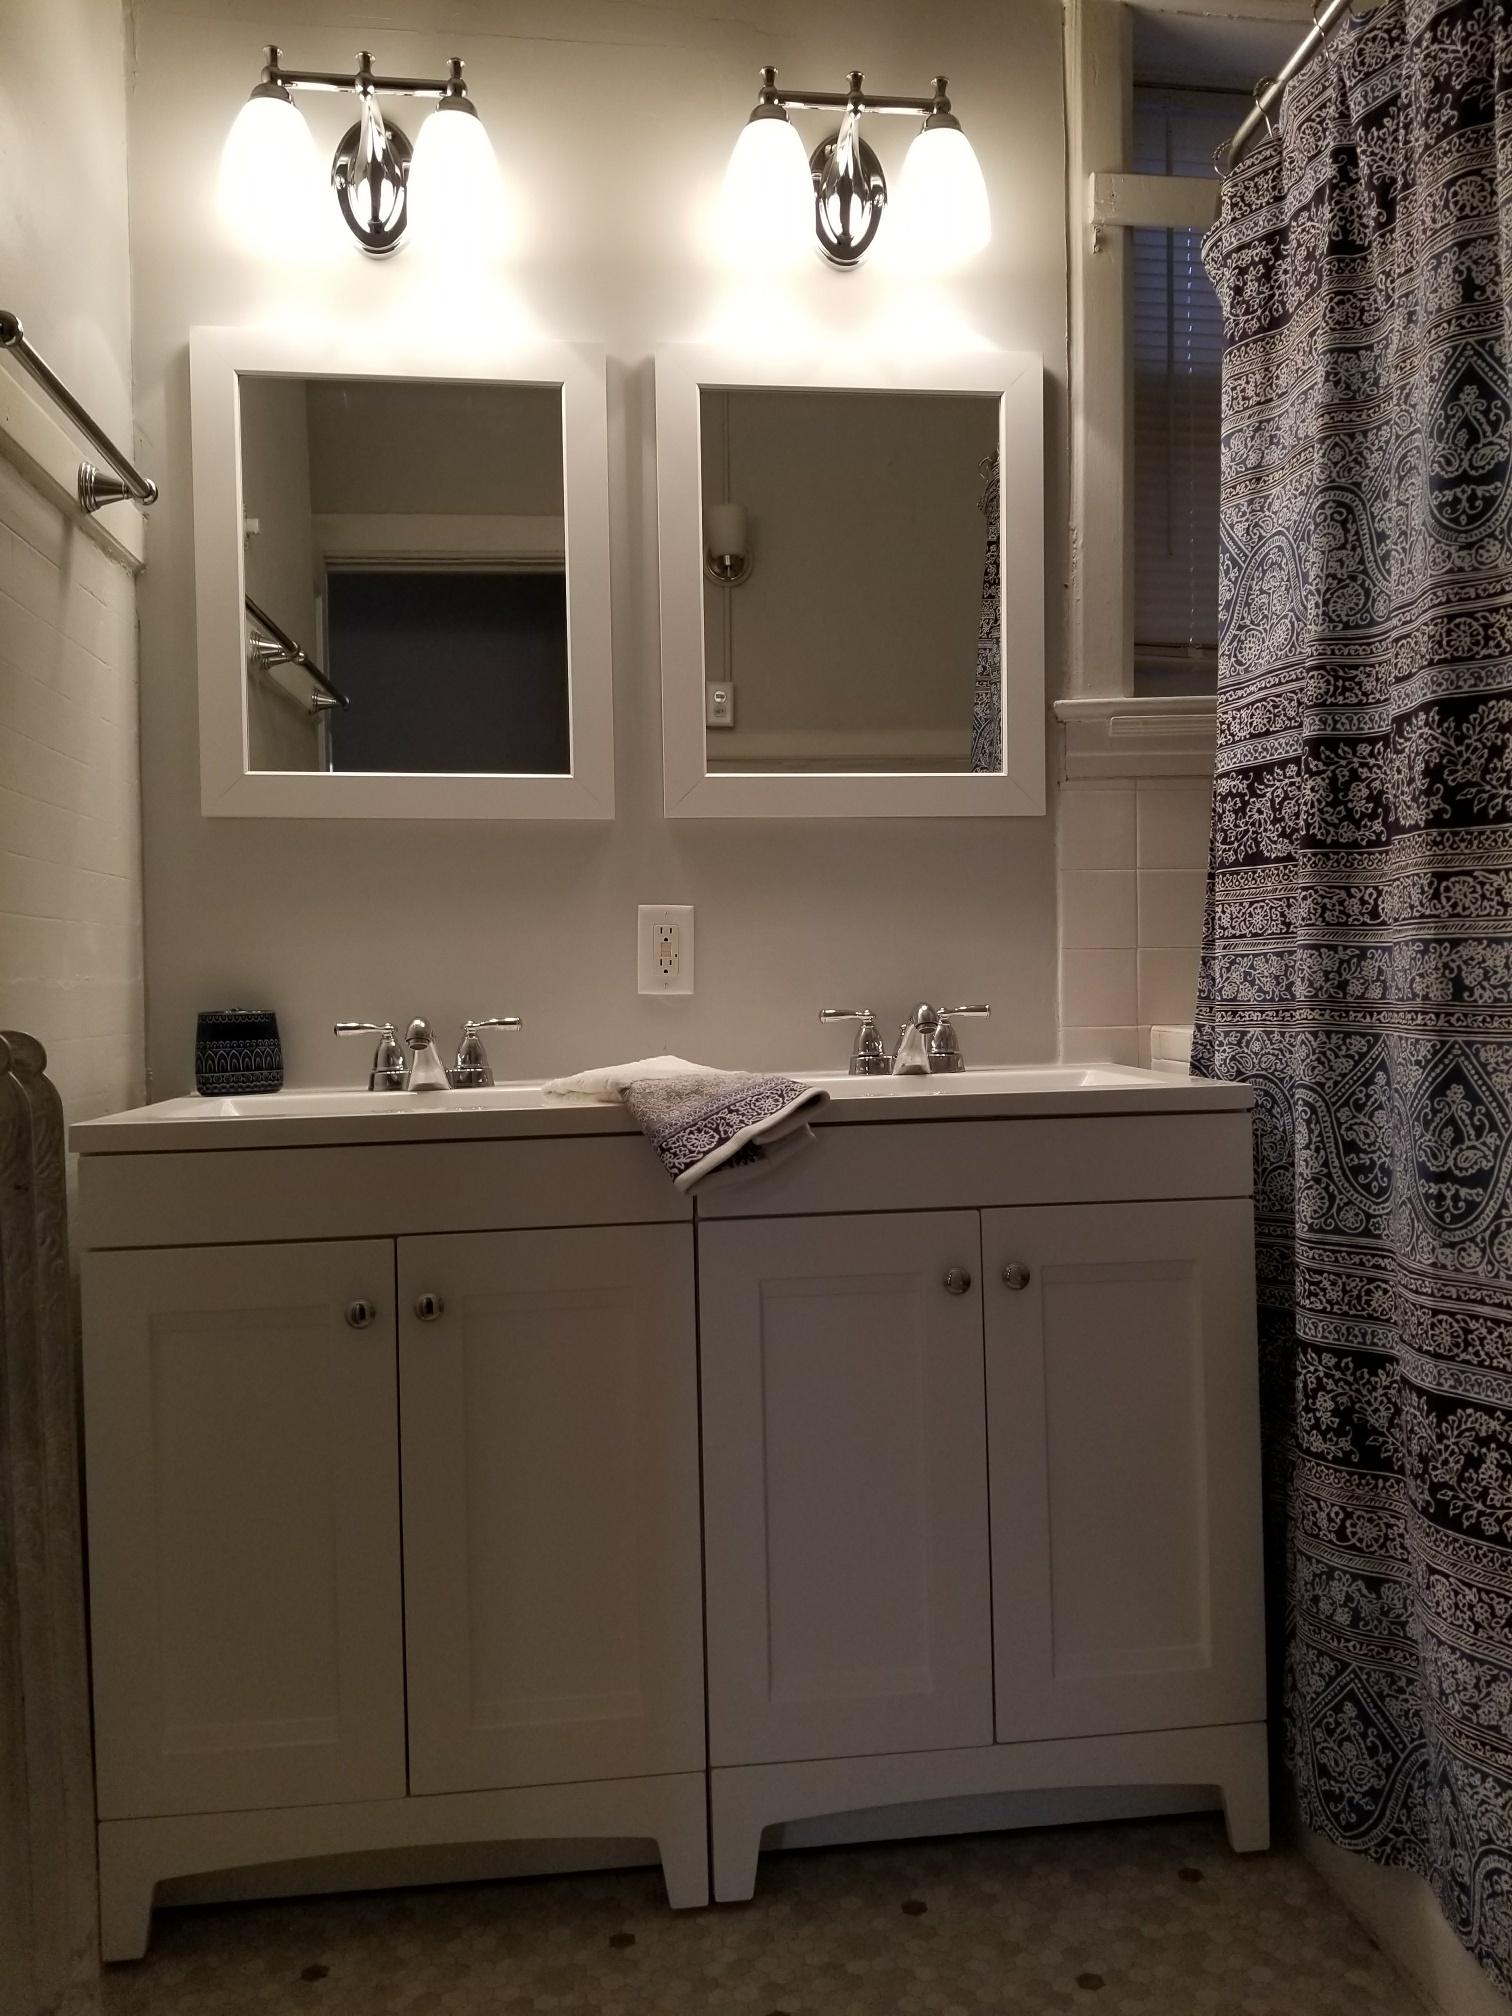 2545-3 bathroom #2.jpg